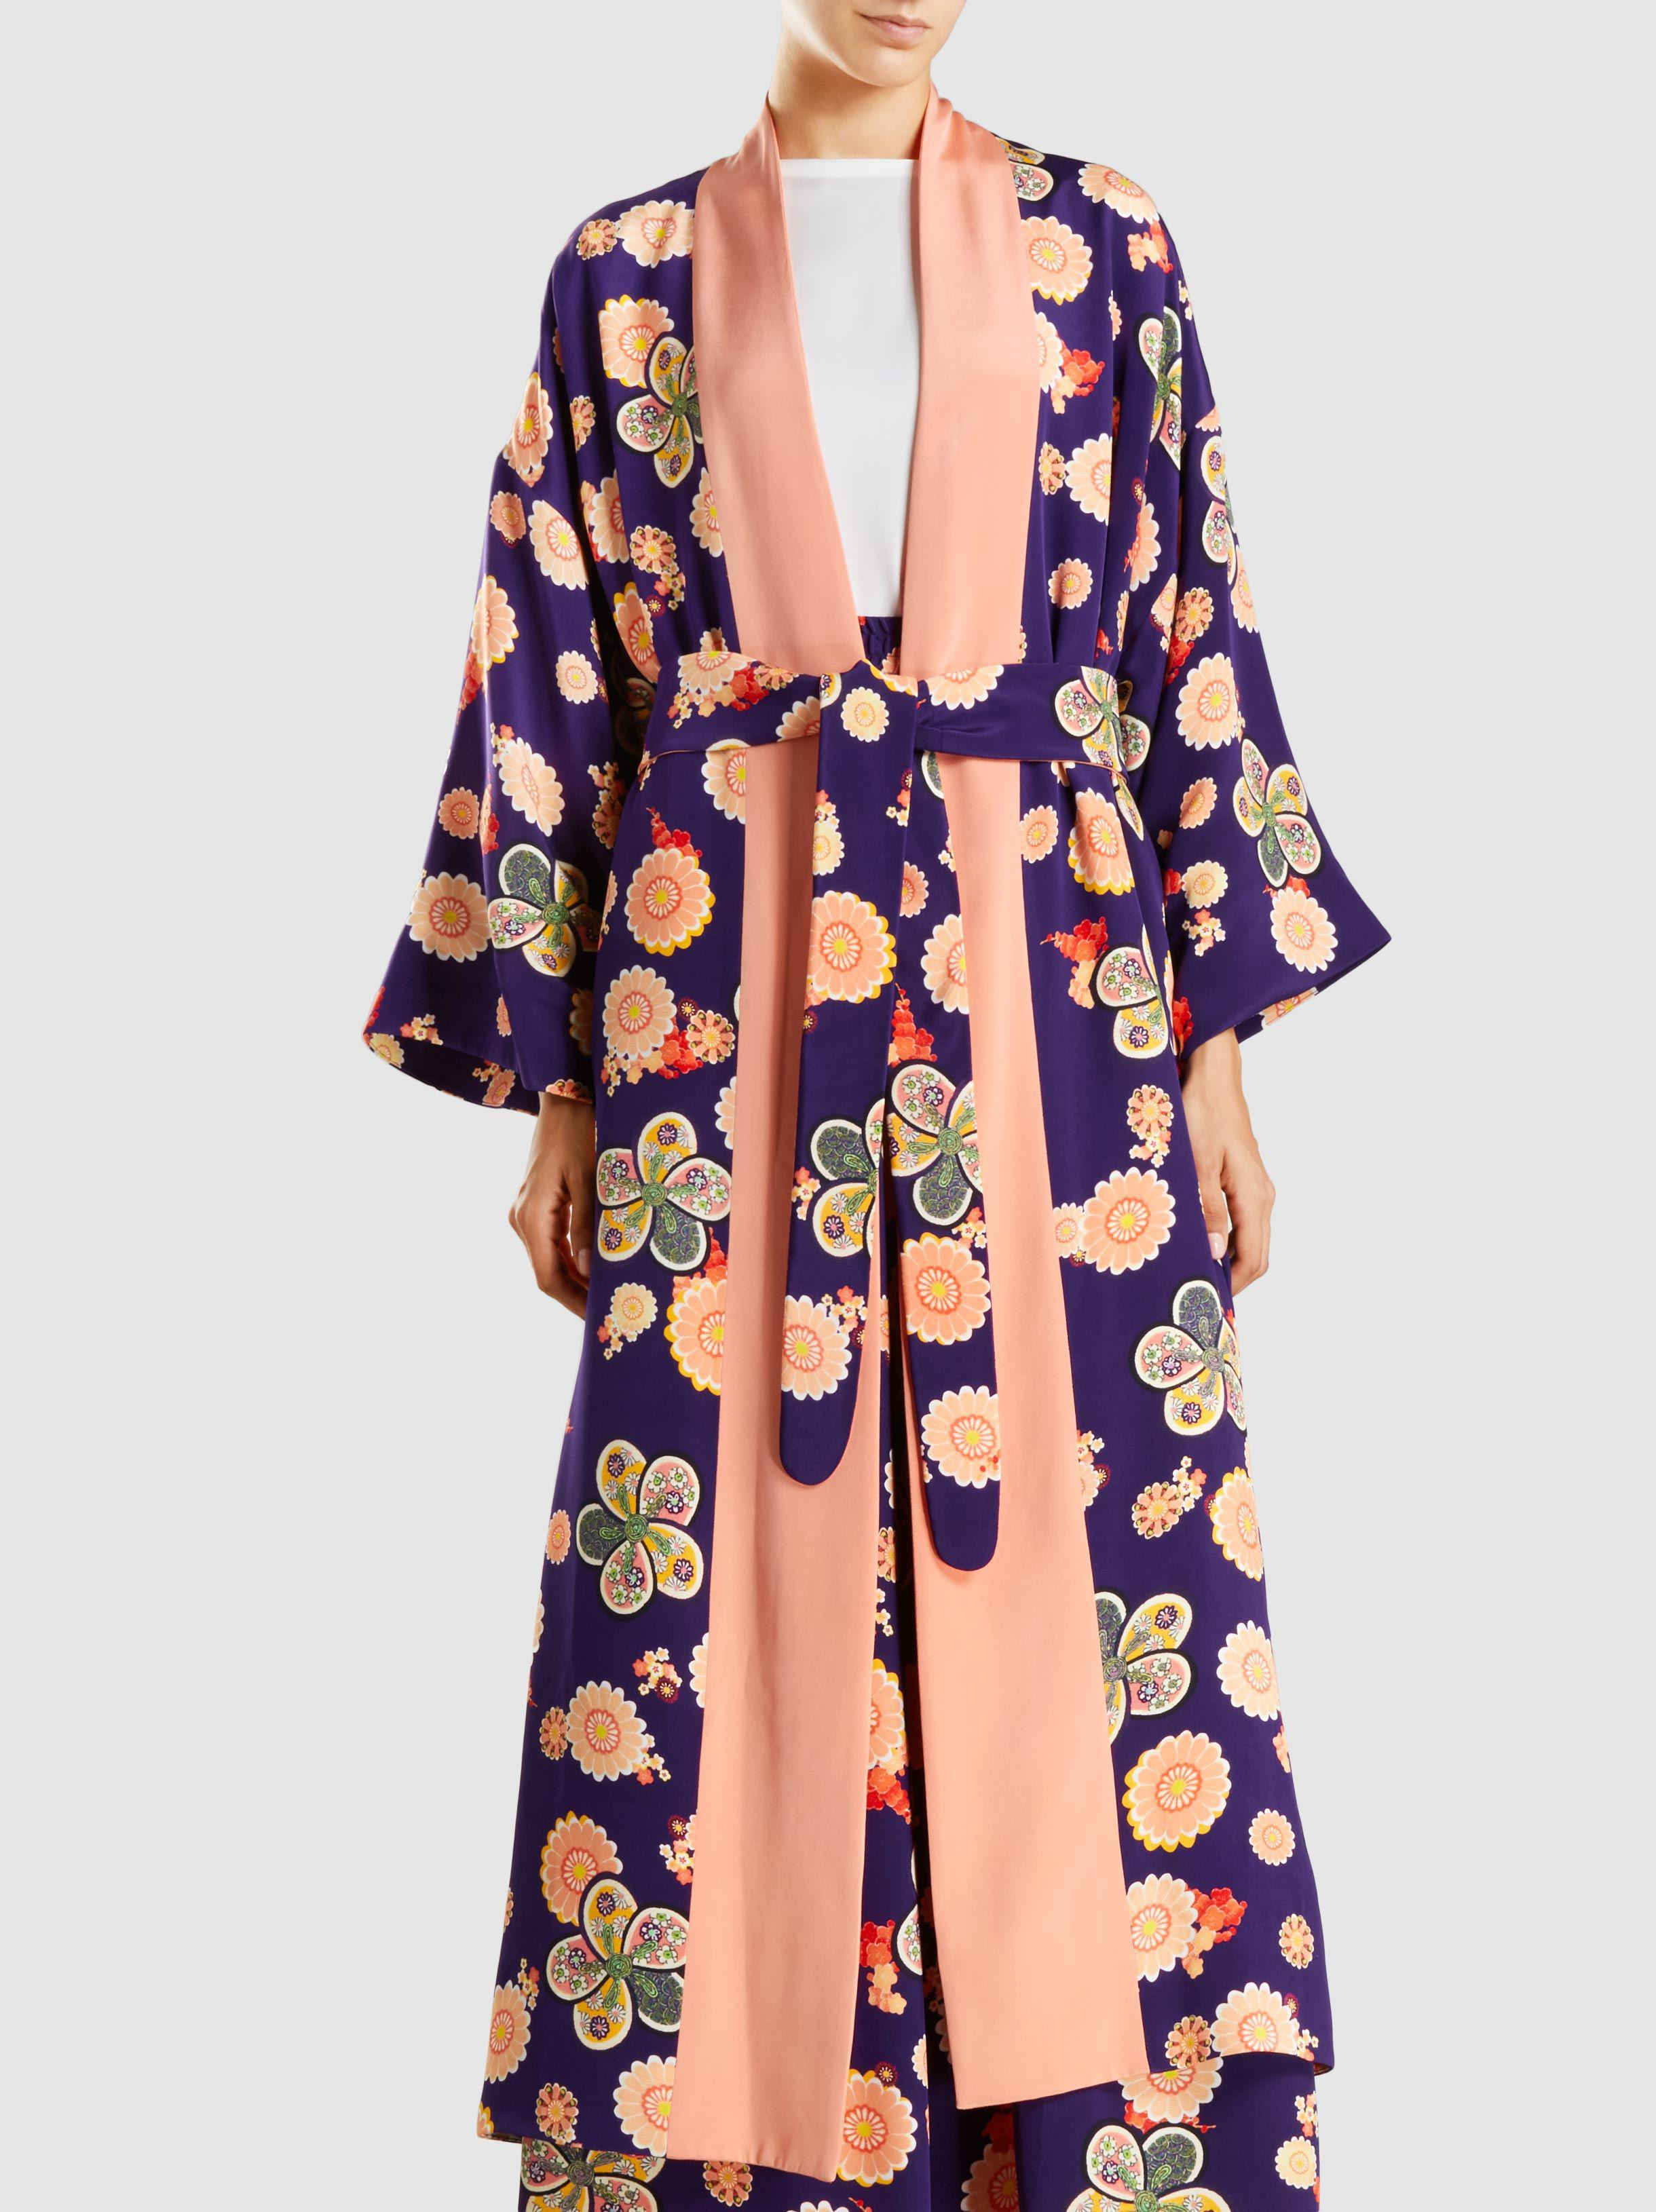 Hatsumomo Floral-Print Silk Kimono Jacket Racil Clearance 100% Authentic Shopping Online Sale Online MBwgtsxezE